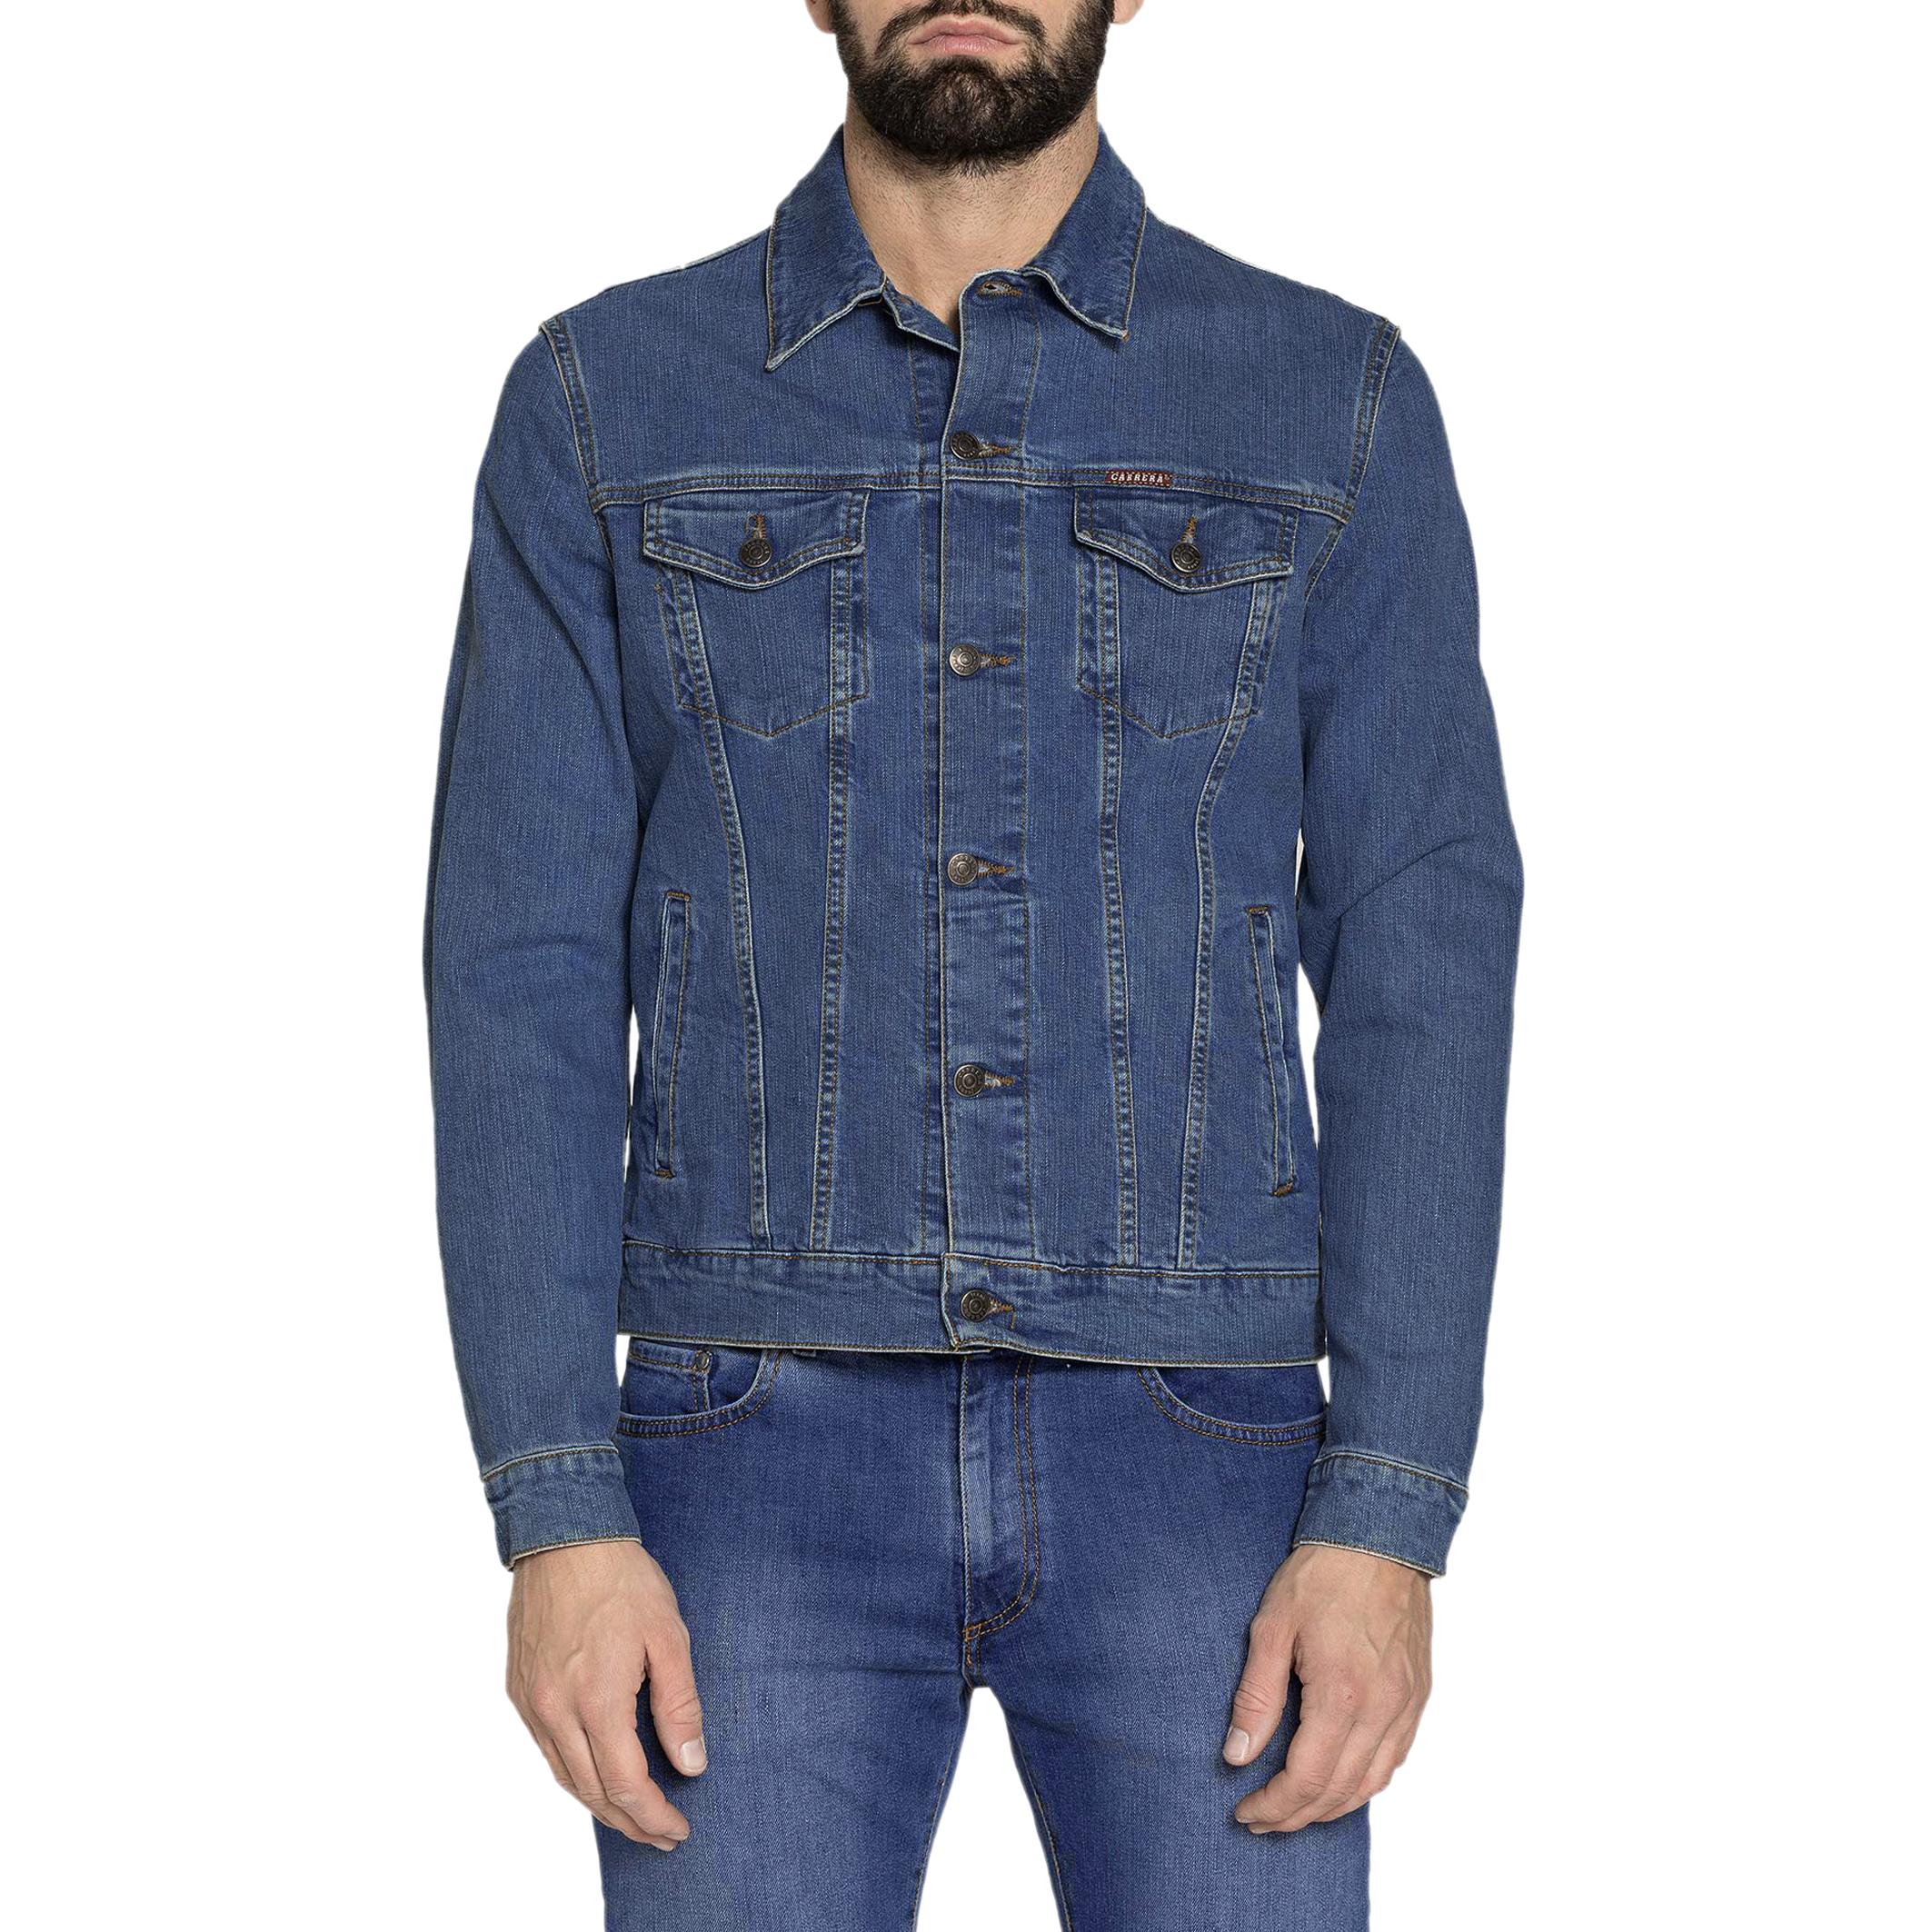 Carrera Jeans 450-970A